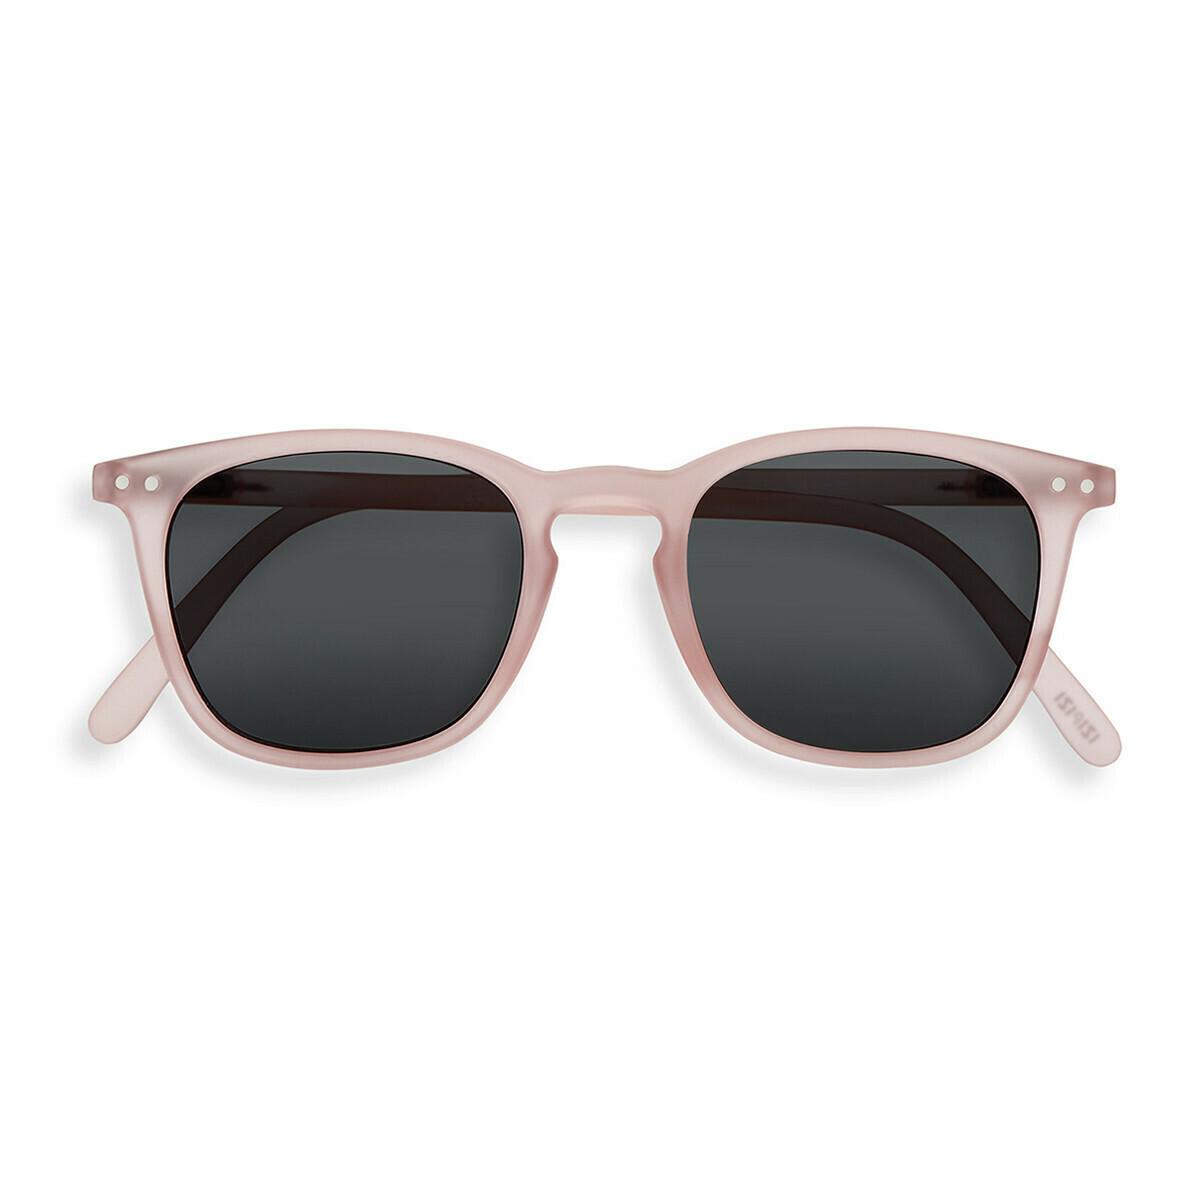 Sunglasses #E - Light Pink